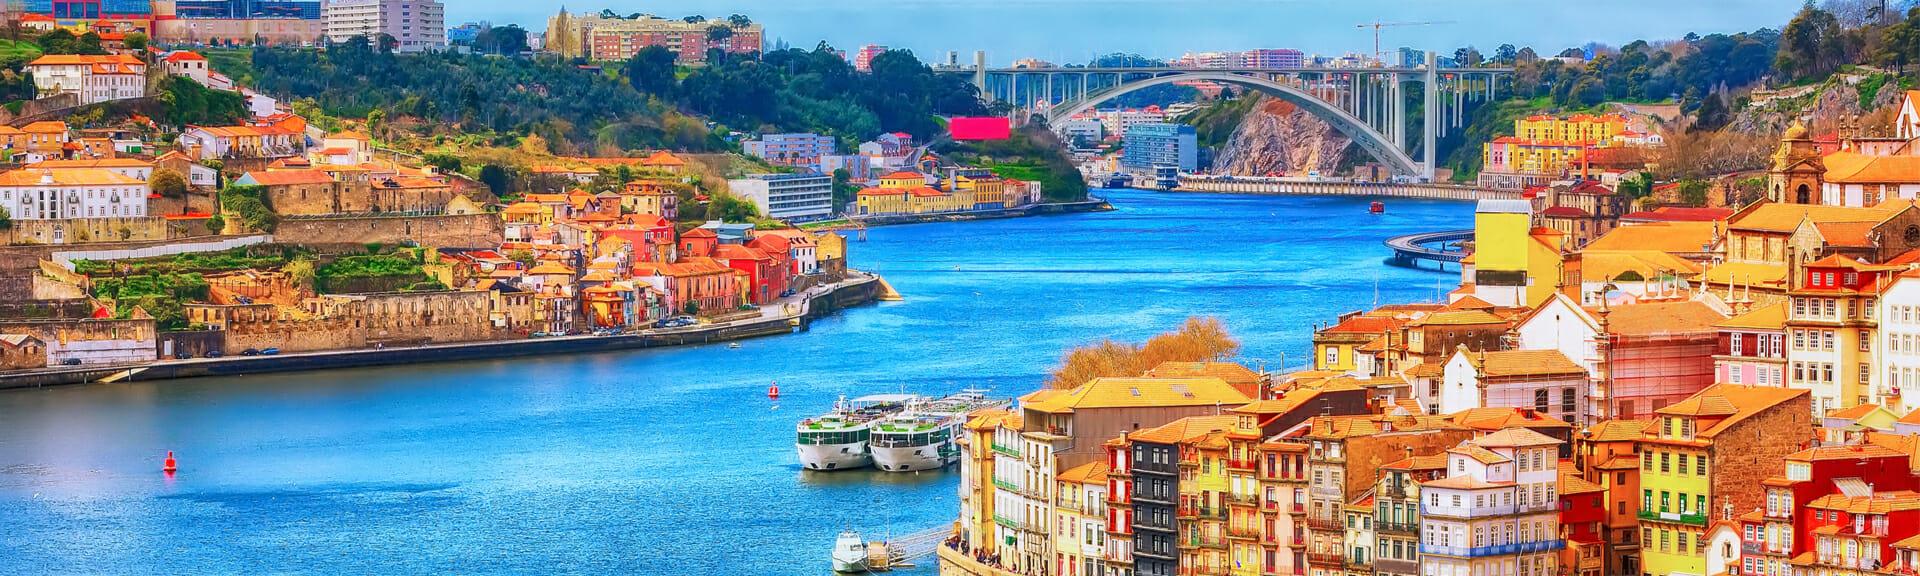 Klassenfahrt Porto Stadtansicht